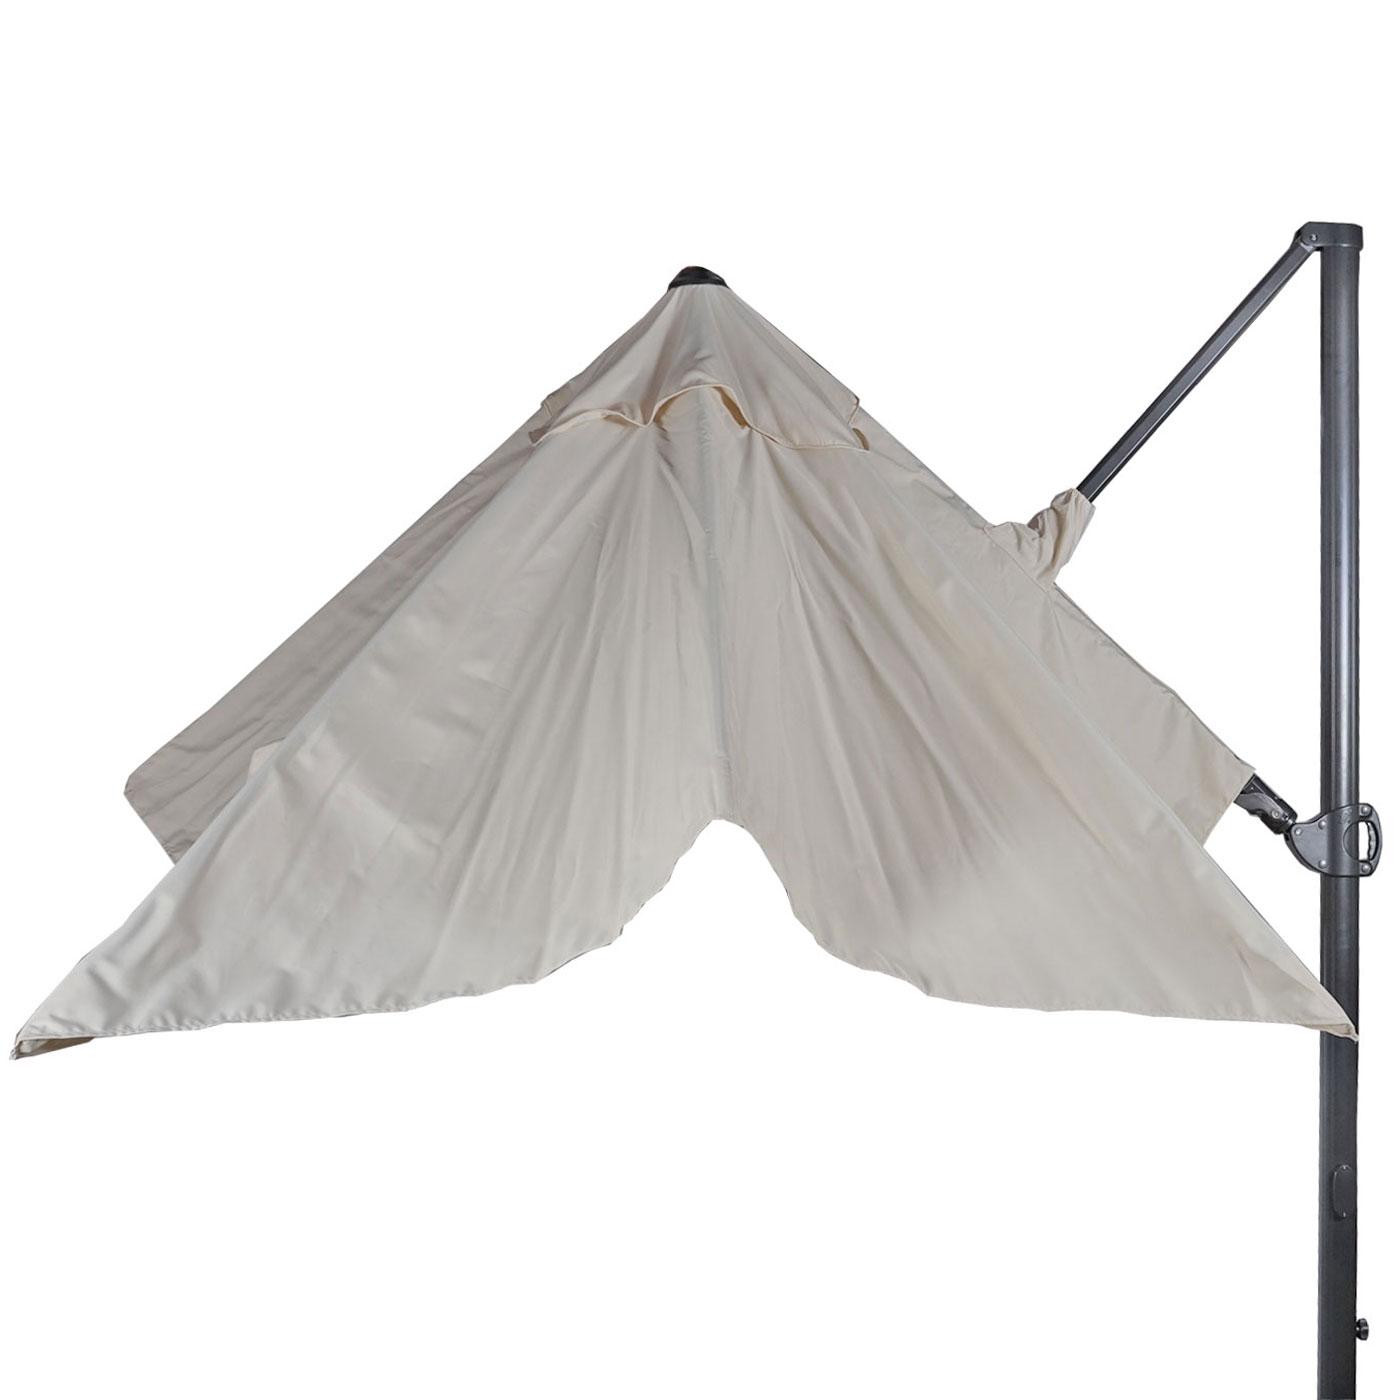 gastronomie ampelschirm 3x3m 4 24m schwenkbar drehbar polyester alu 31kg creme ohne. Black Bedroom Furniture Sets. Home Design Ideas